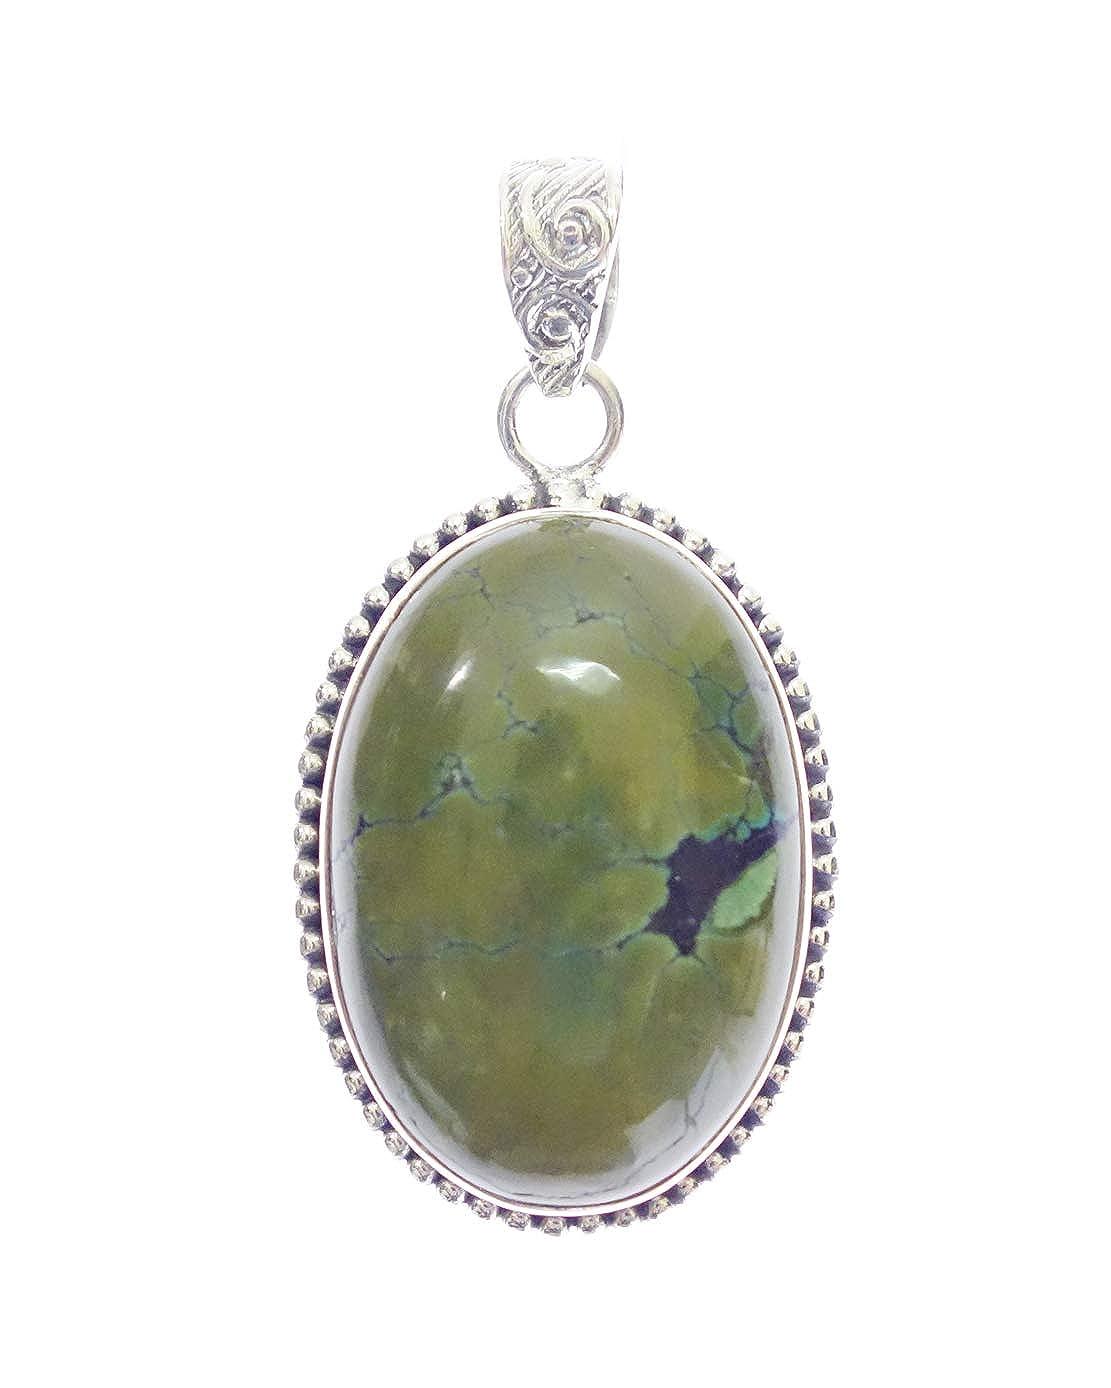 925 Sterling Silver Necklace Pendant for Woman Unisex Turquoise Healing Gemstone Pendant Authentic Fashion Designer Ethnic Boho FINE Genuine Handmade Jewelry Unique Tibetan Amulet